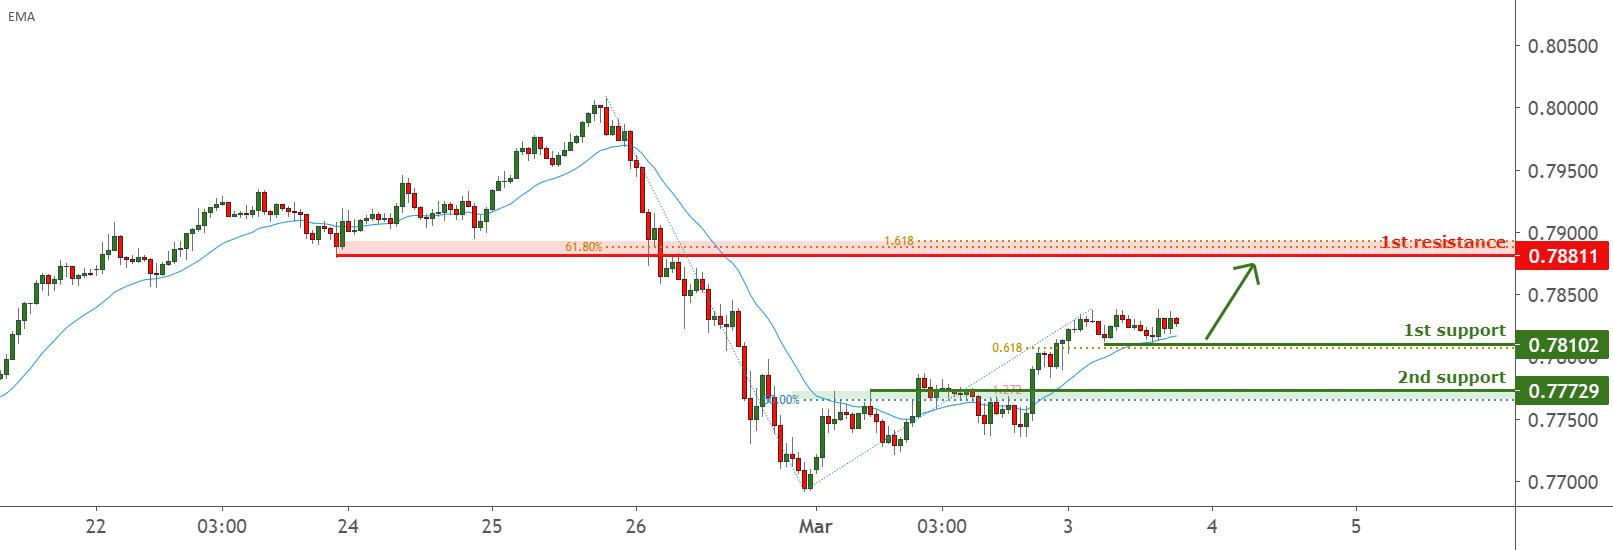 AUDUSD is facing bullish pressure for FX:AUDUSD by FXCM